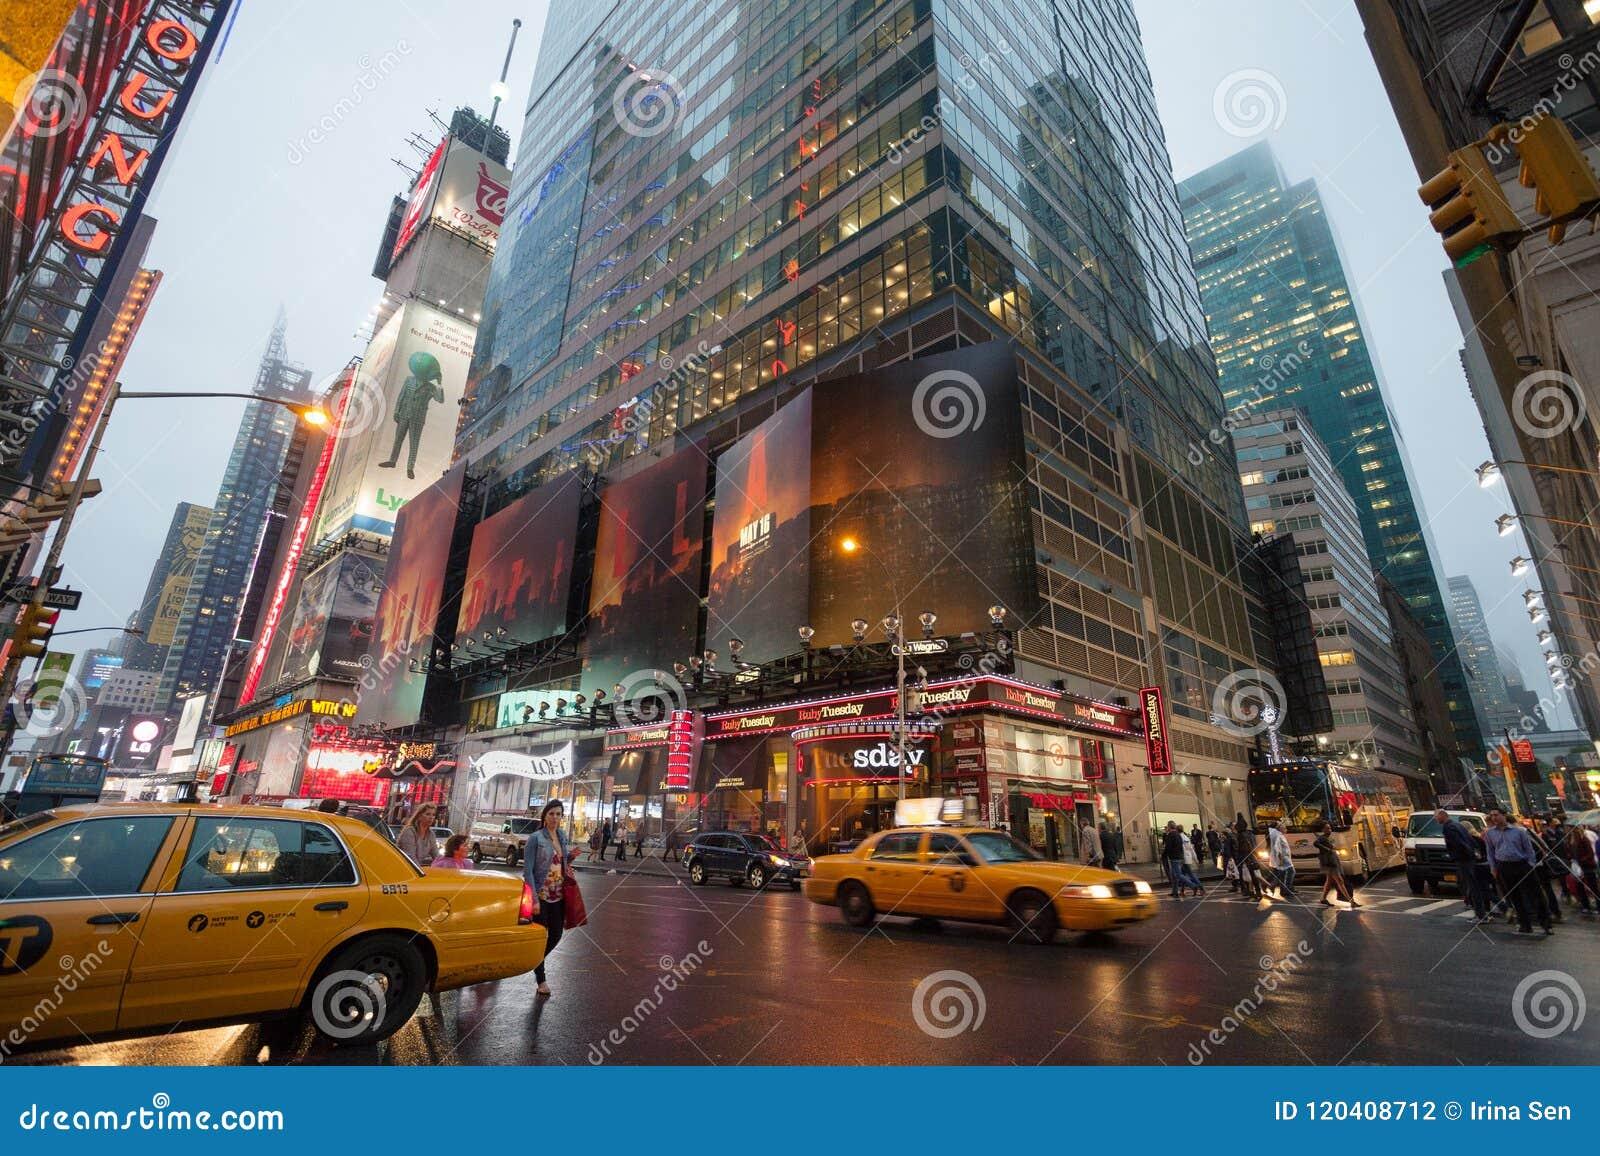 Foggy Manhattan - Night traffic nearby Times square, New York, Midtown, Manhattan. New York, Unites States